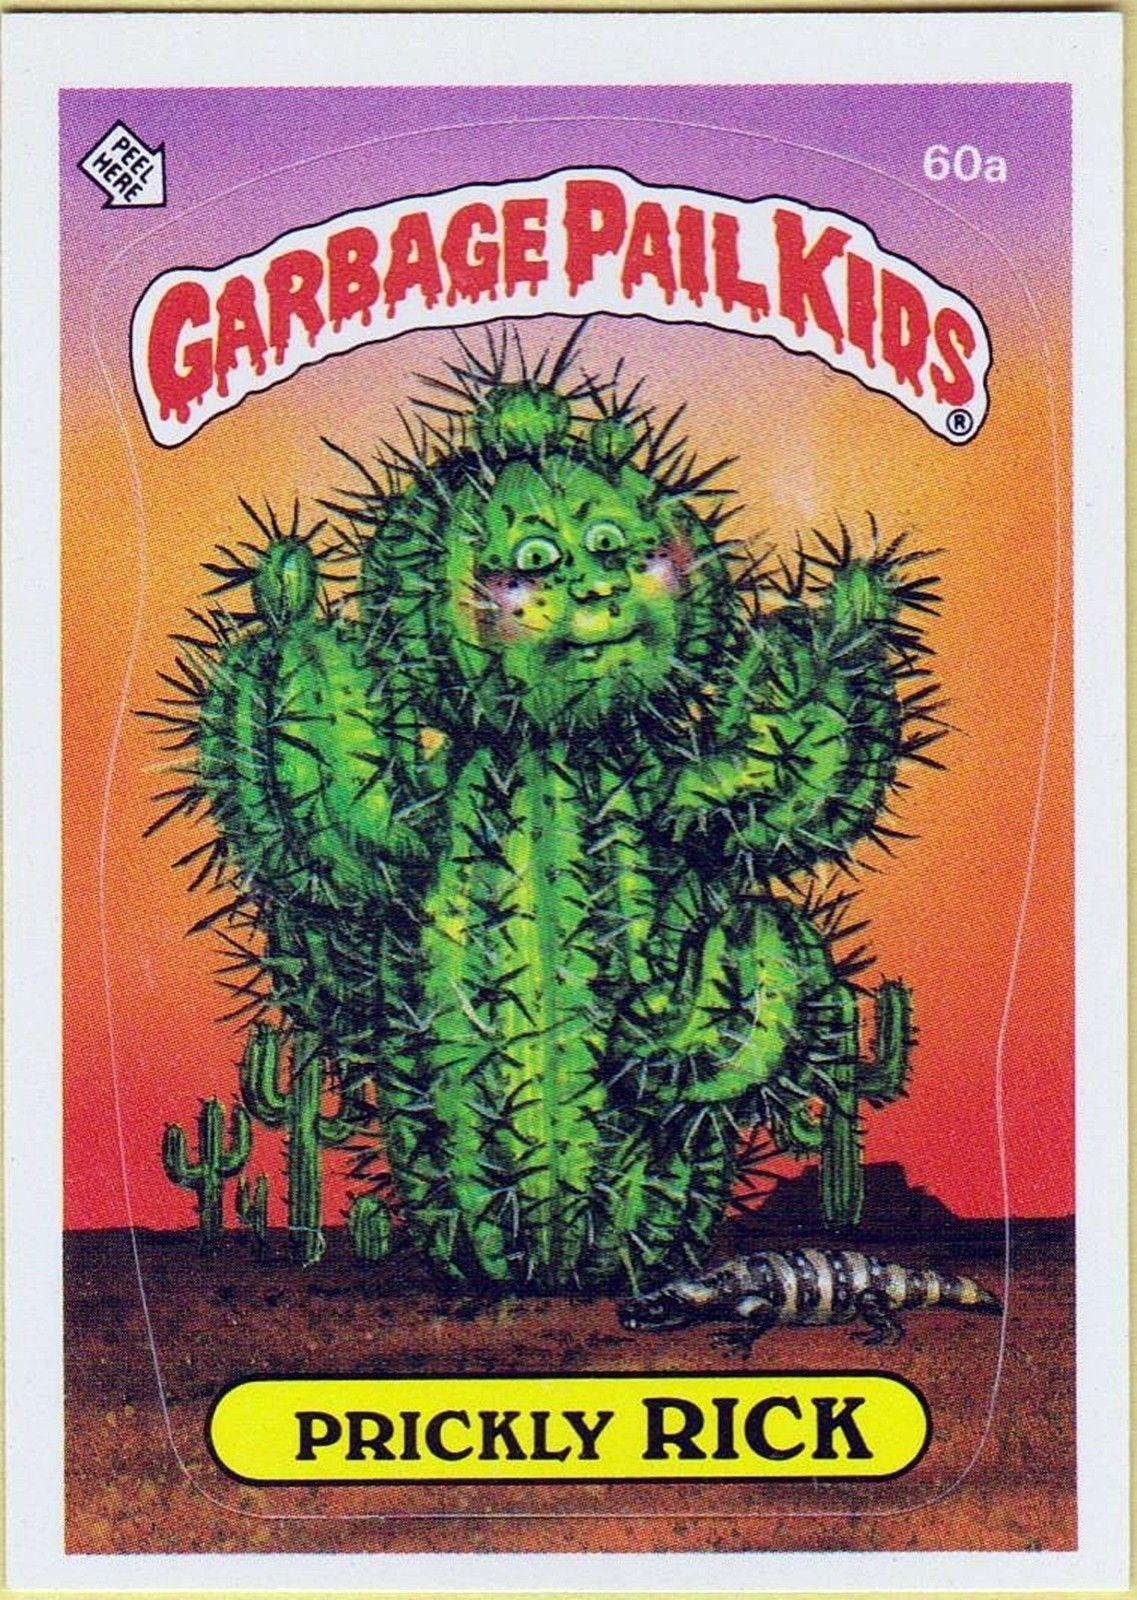 Garbage Pail Kids Garbage Pail Kids Garbage Pail Kids Cards Pail